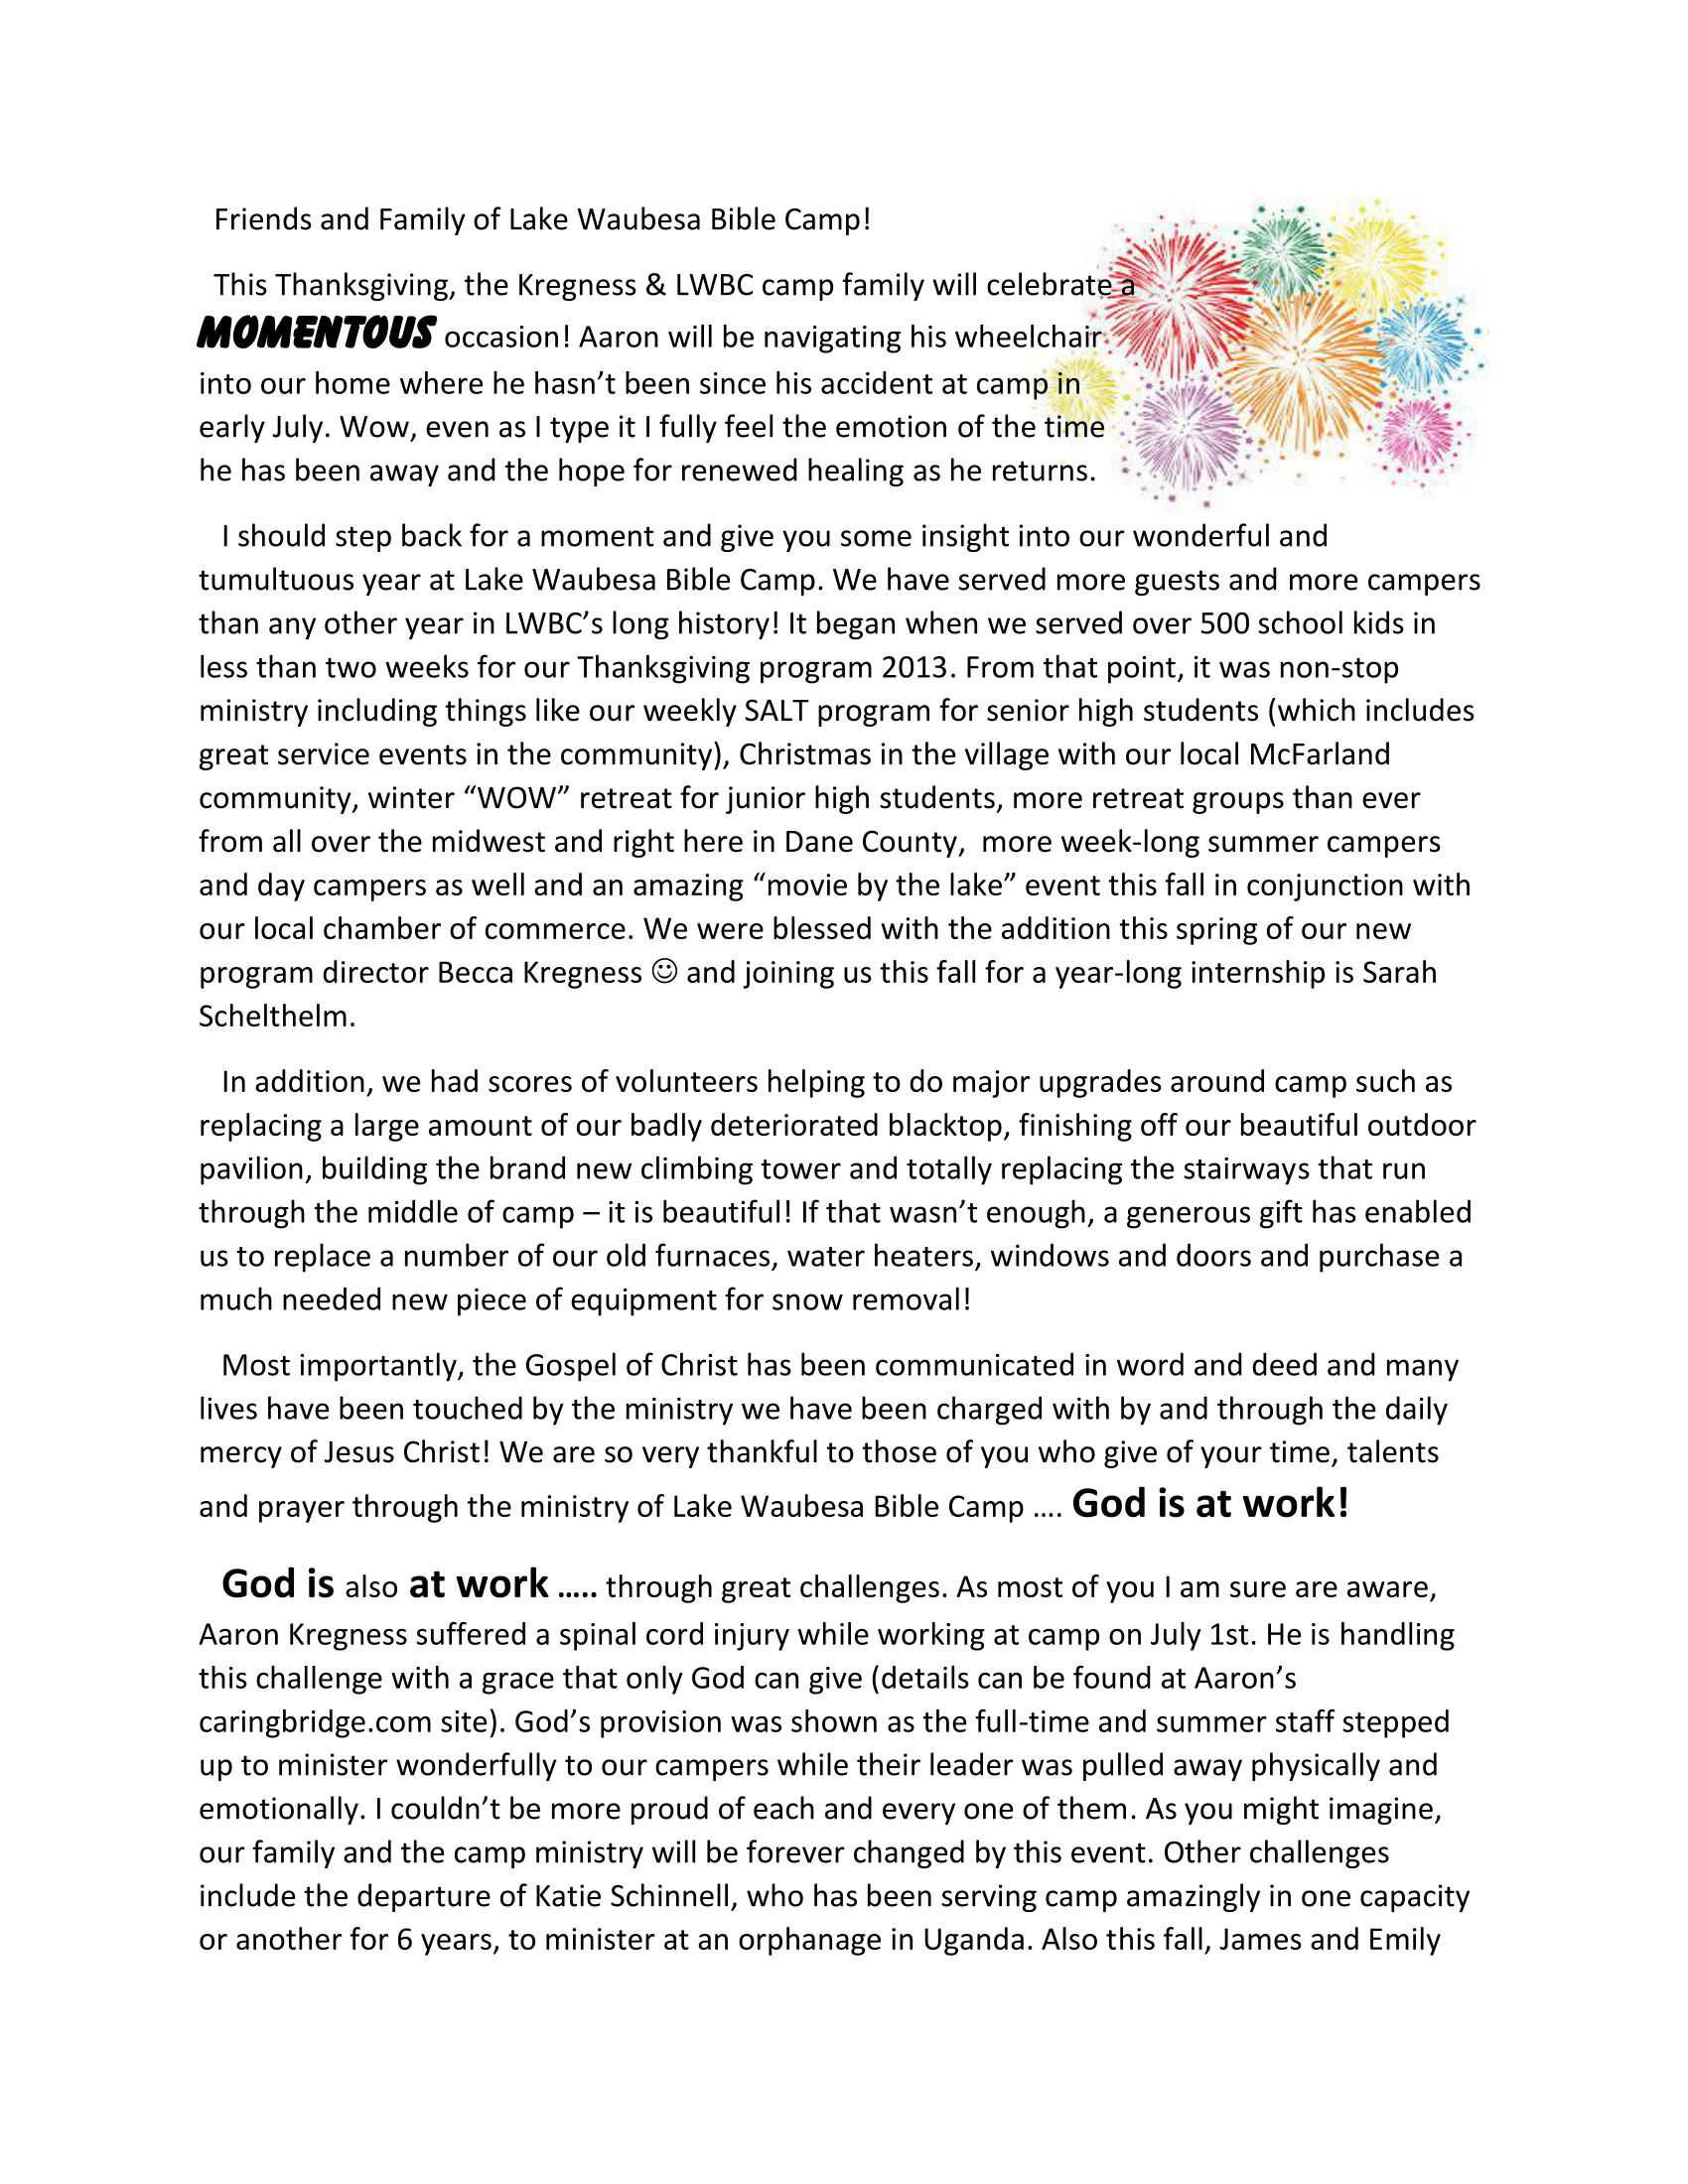 fall 2014 letter-1